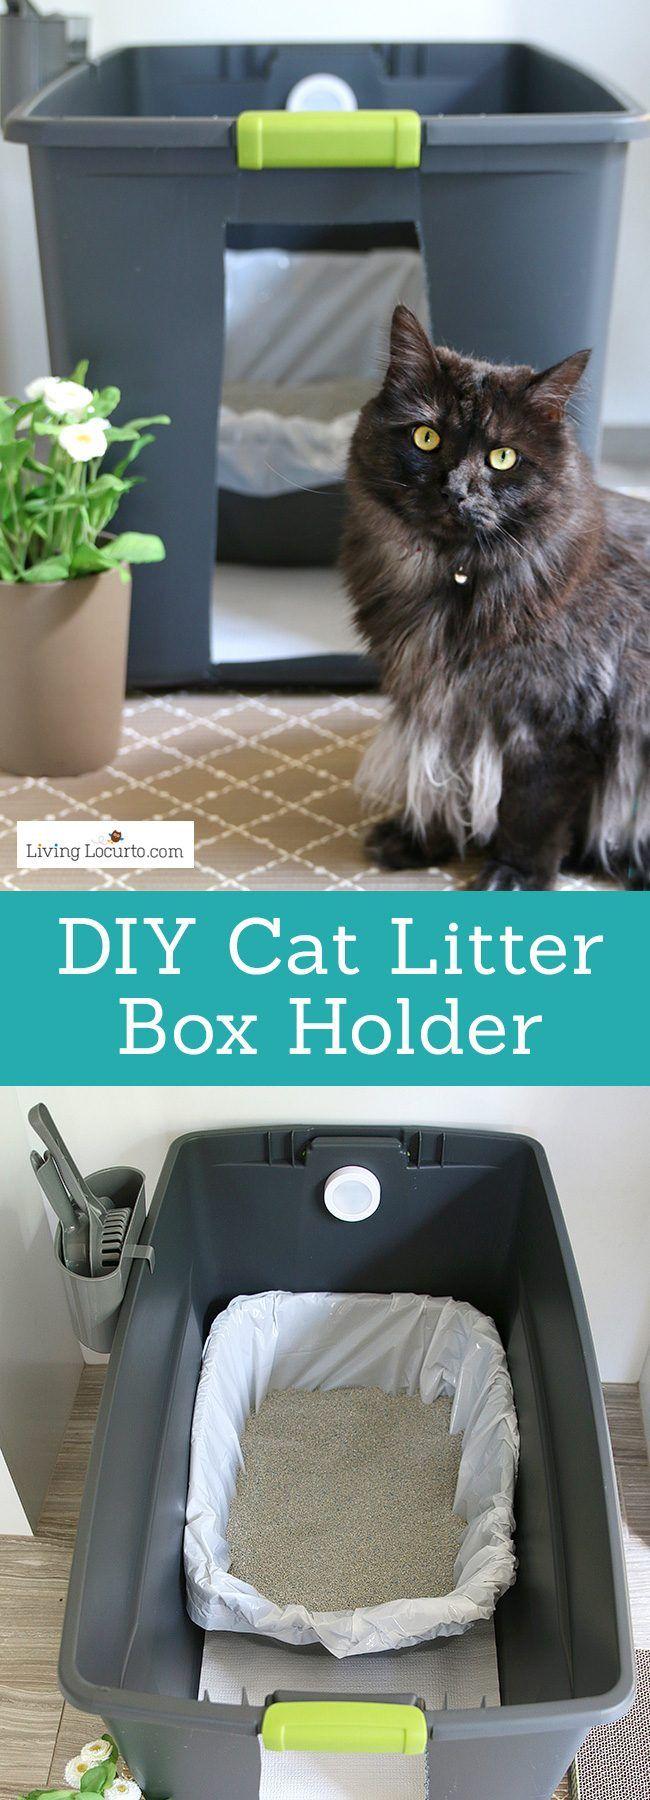 Best 25+ Product box ideas on Pinterest | Paper box tutorial, Make box and  Scrapbook box